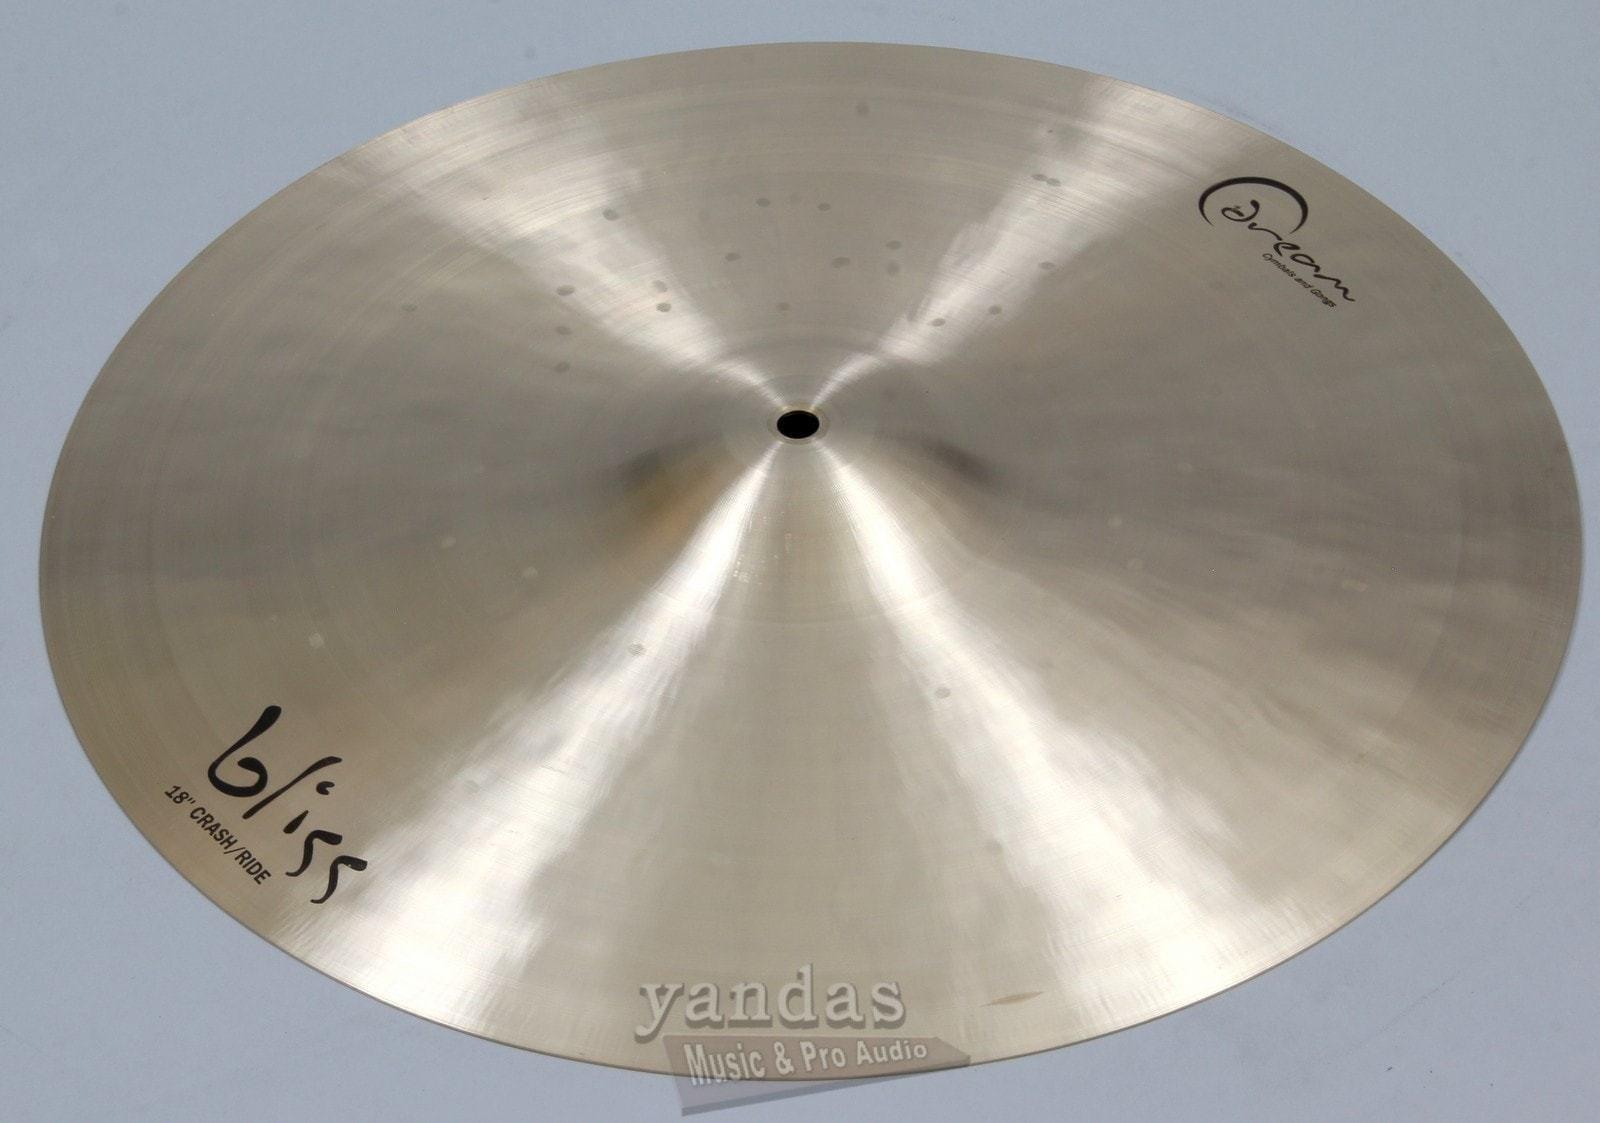 Dream Cymbals BCRRI18 Bliss Series Crash/Ride 18'' Cymbal by Dream